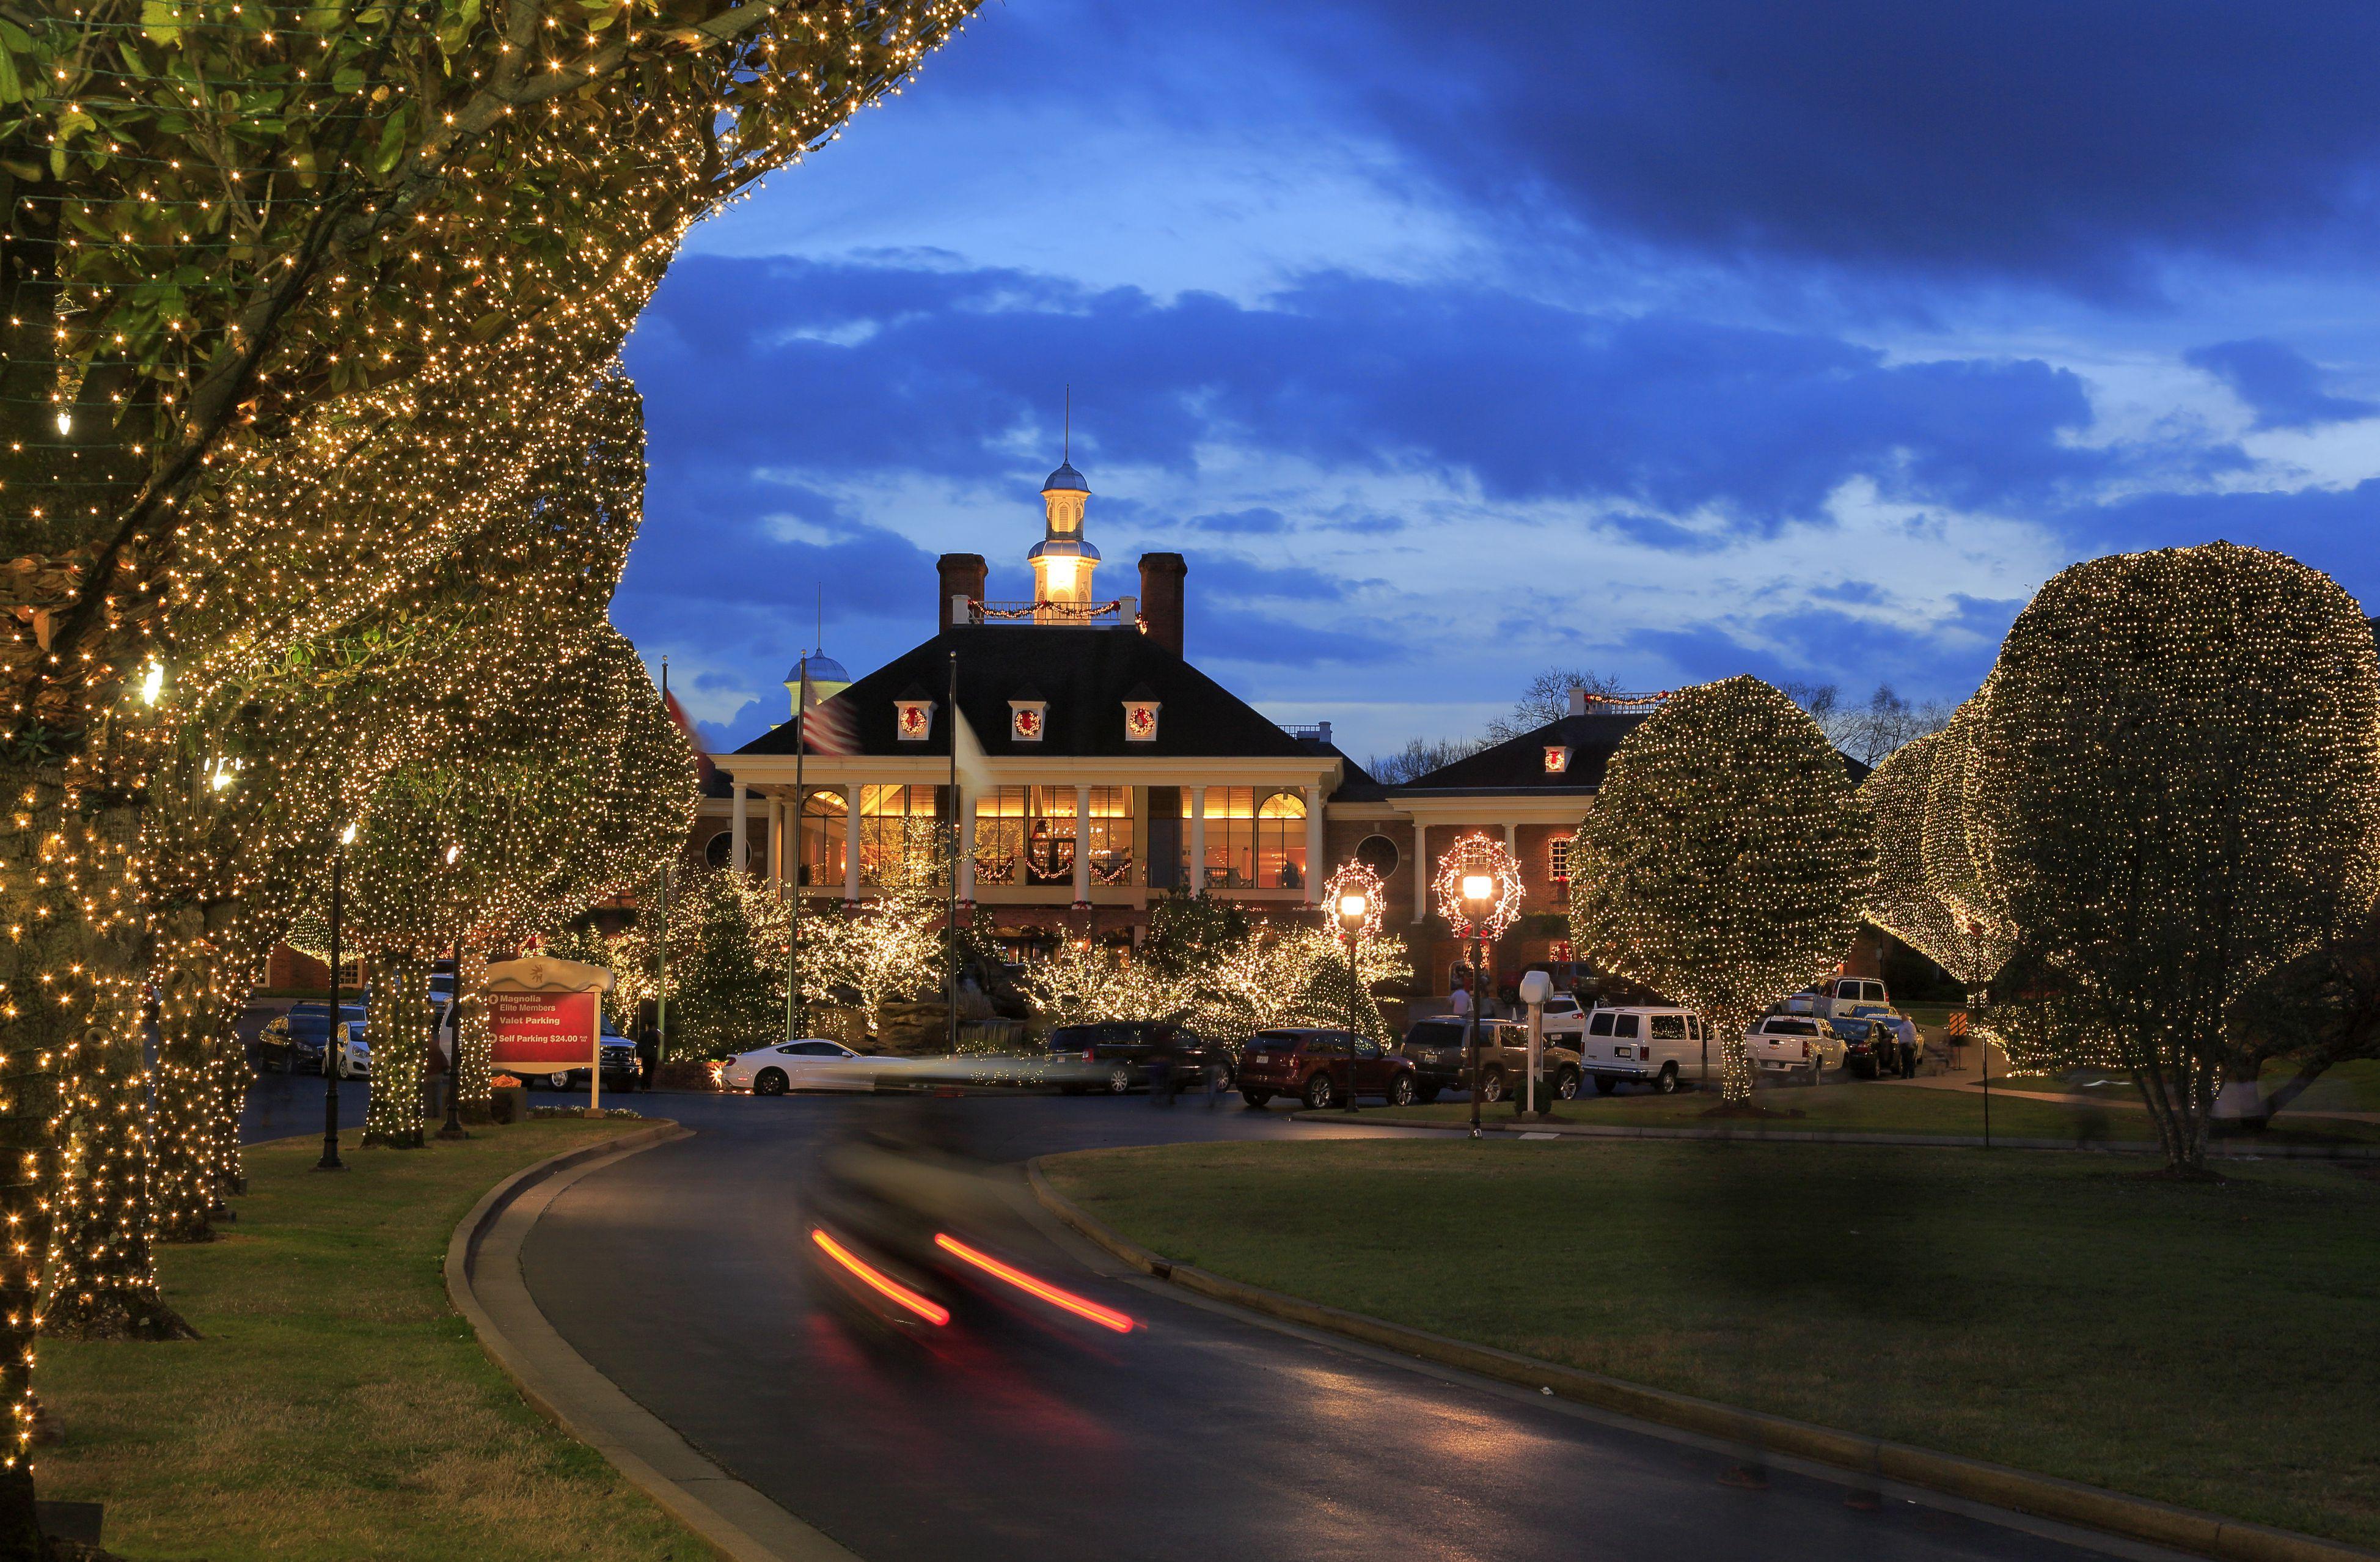 Maps of Nashville\'s Opryland Hotel